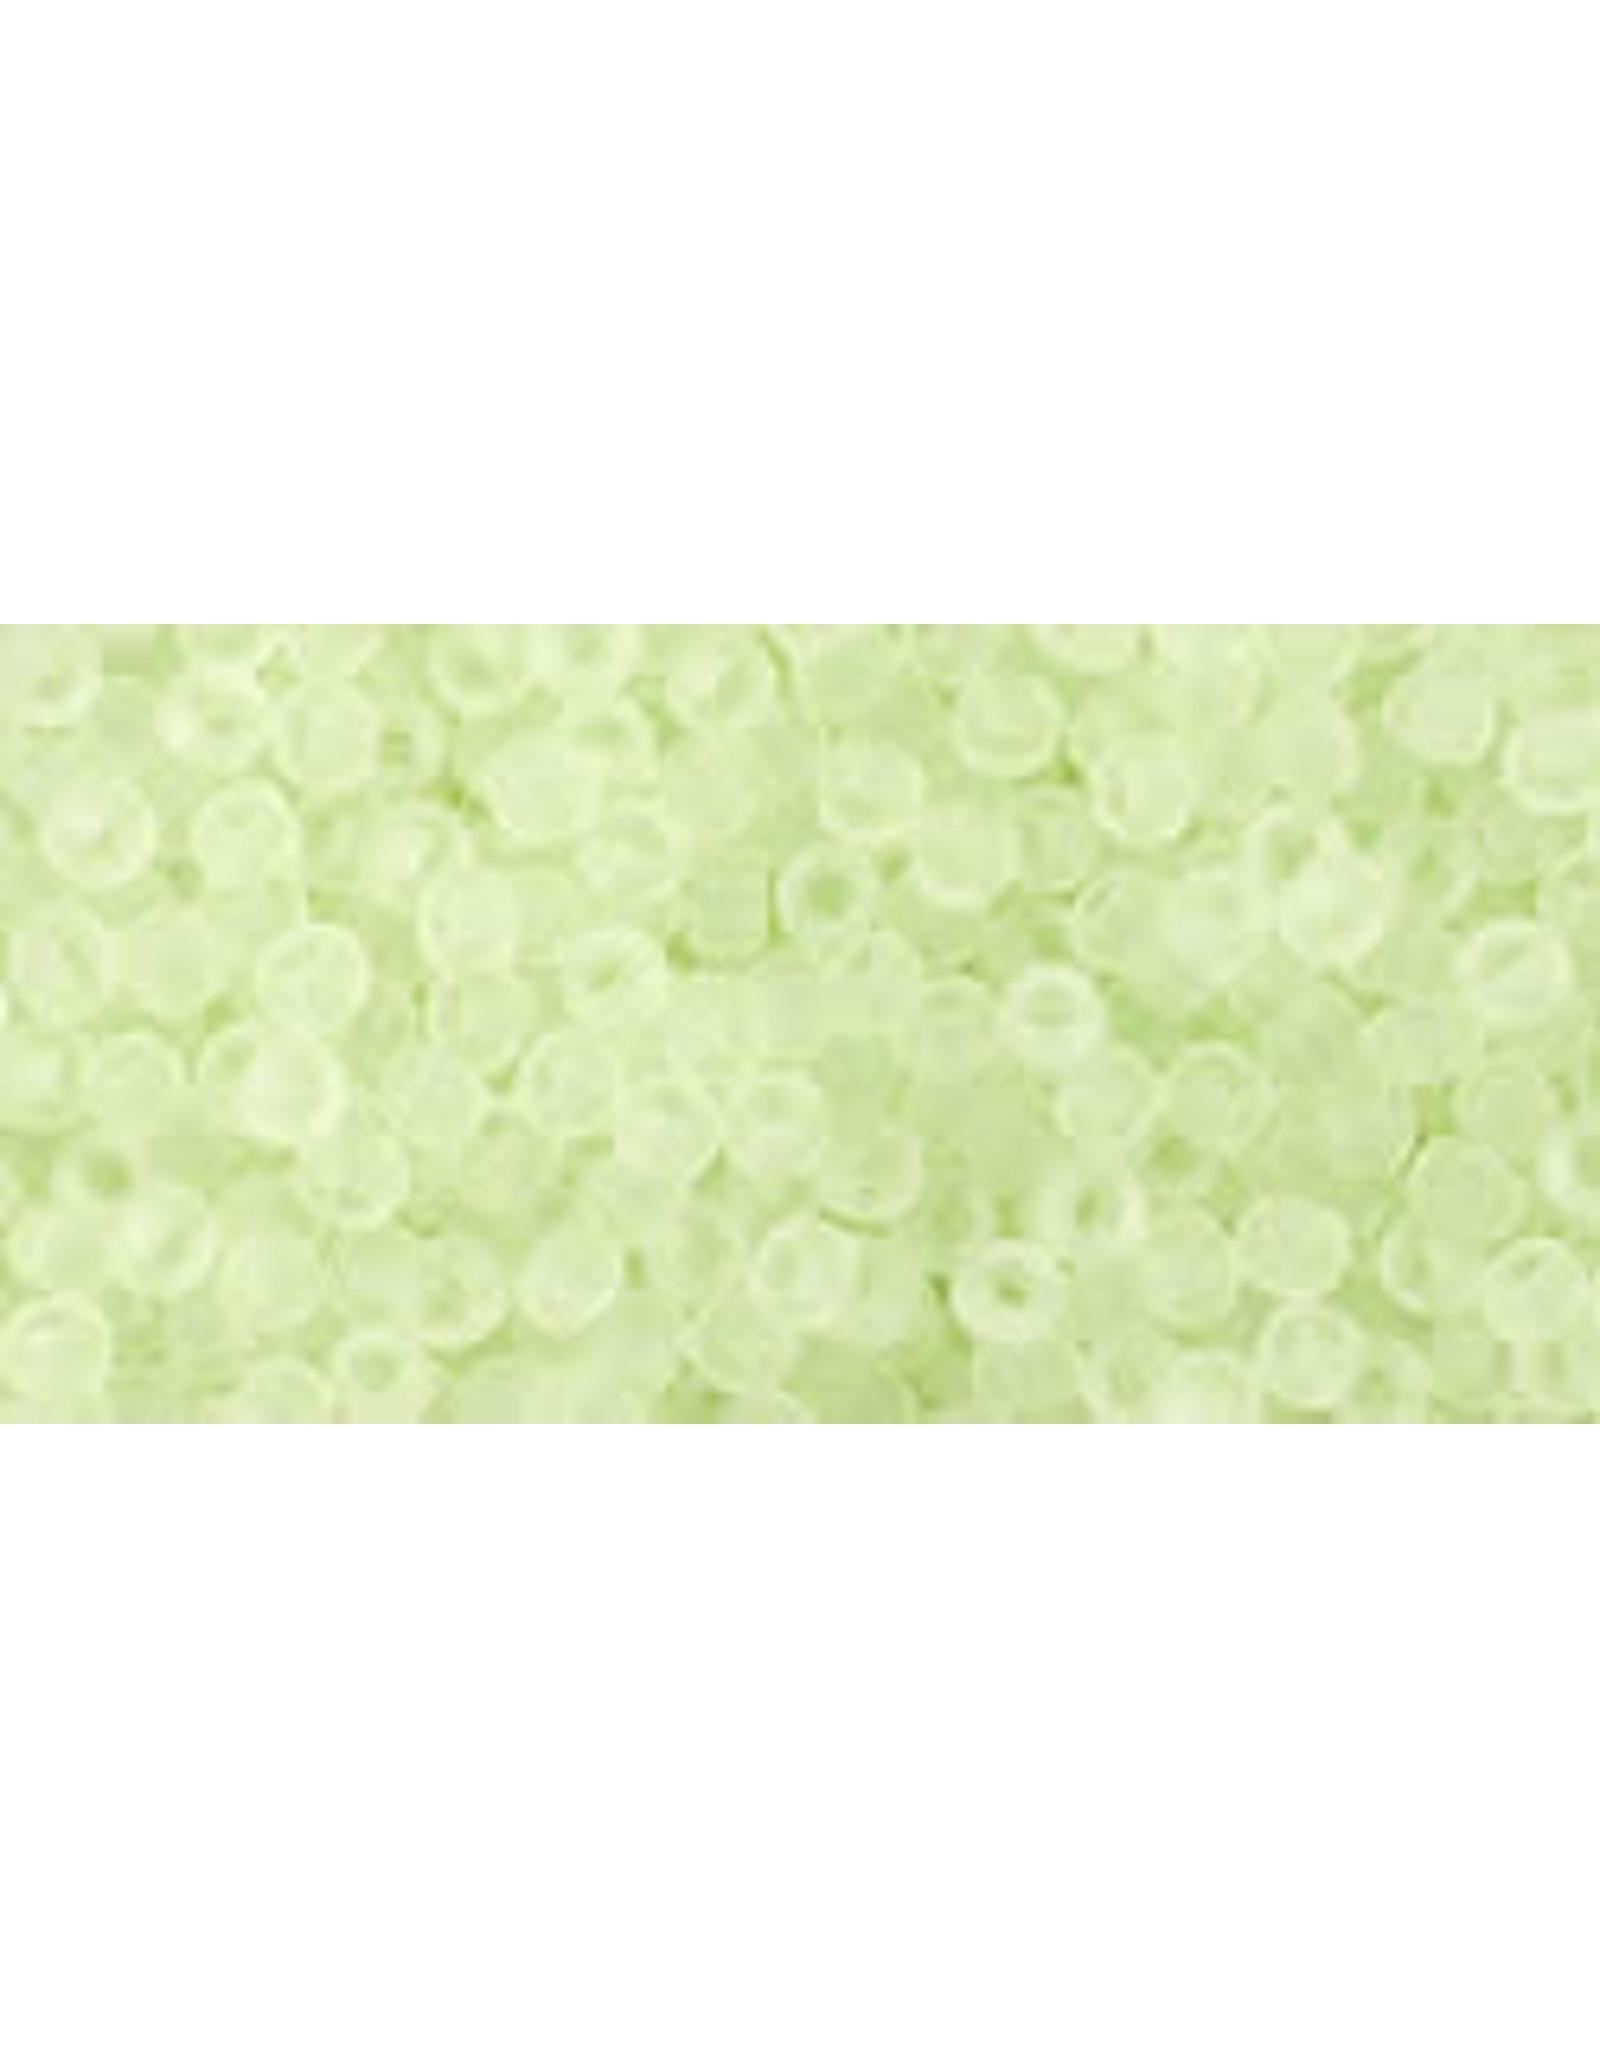 Toho 15f 11 Toho Round 6g Citrus Spritz Green